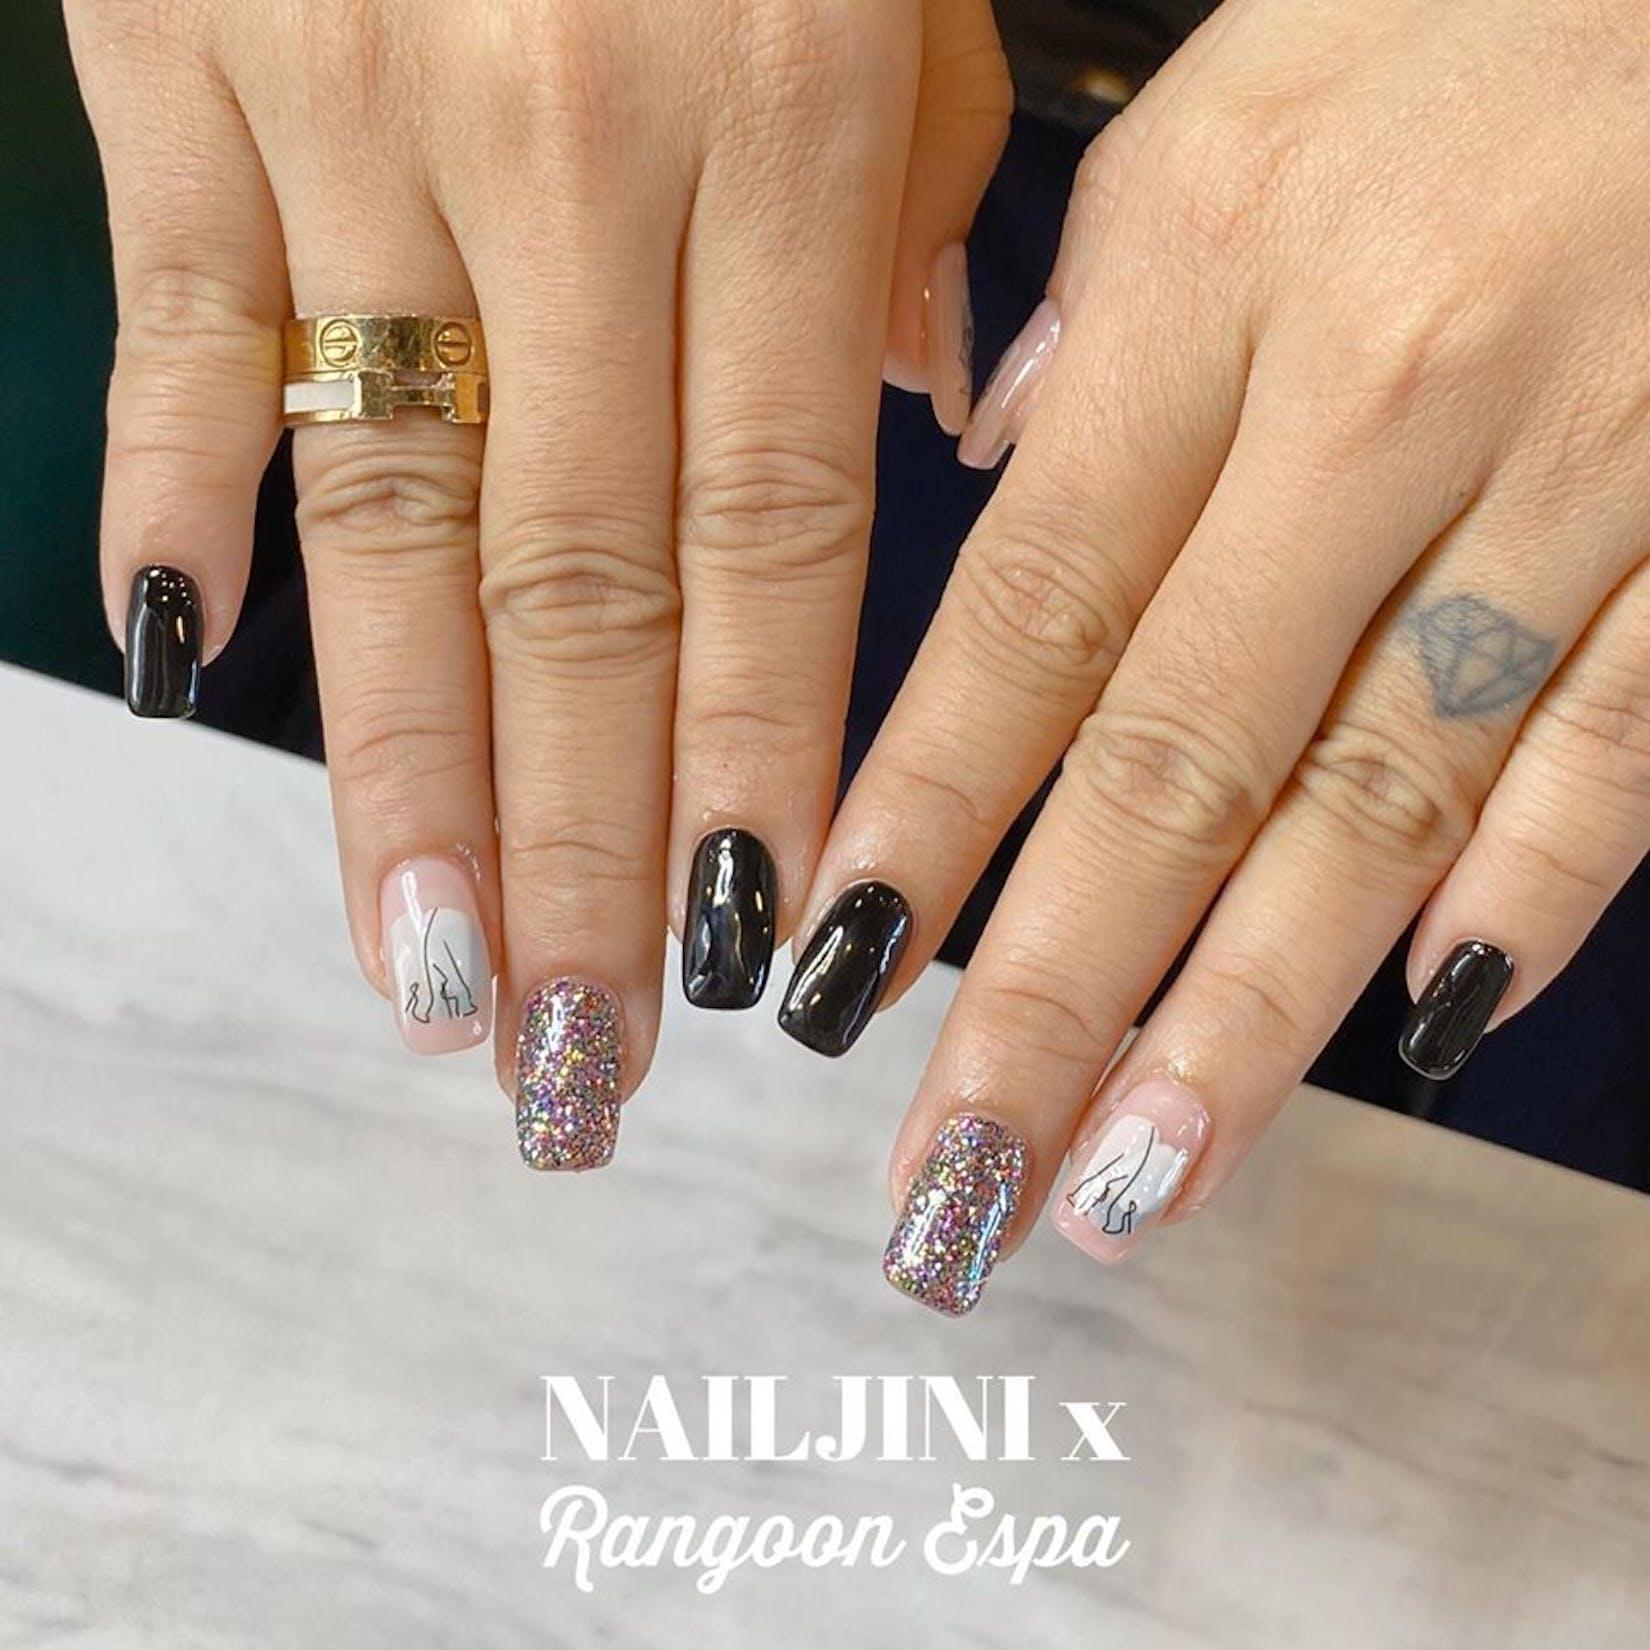 NailJini | Beauty